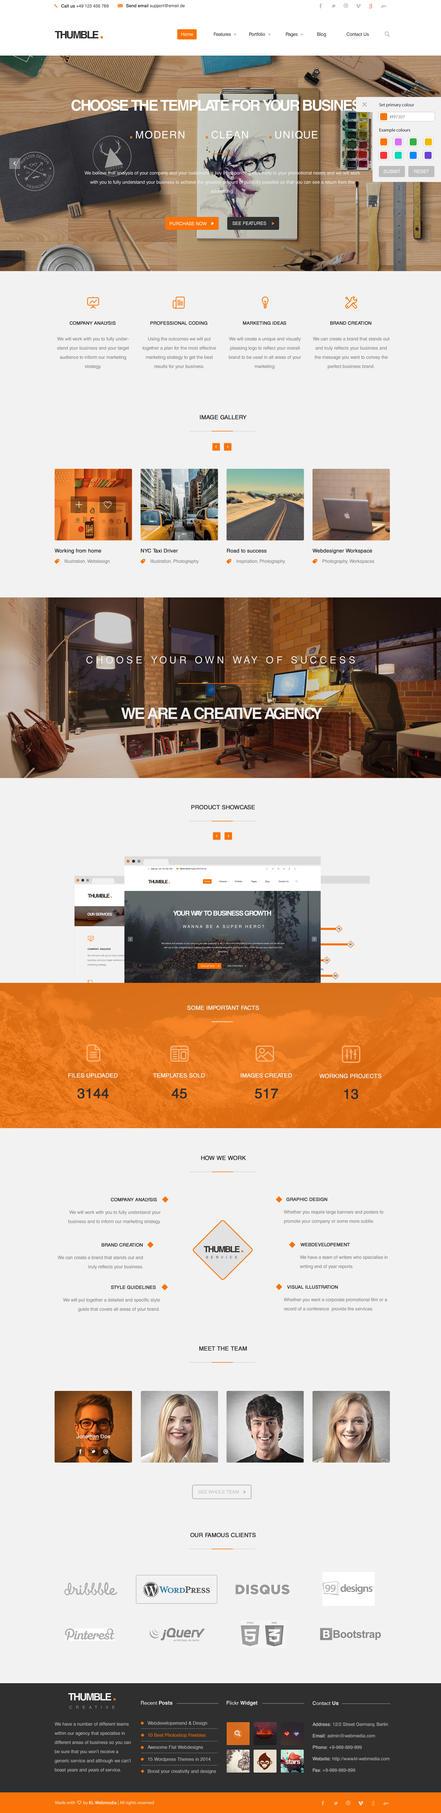 Thumble - Creative Wordpress Theme by KL-Webmedia